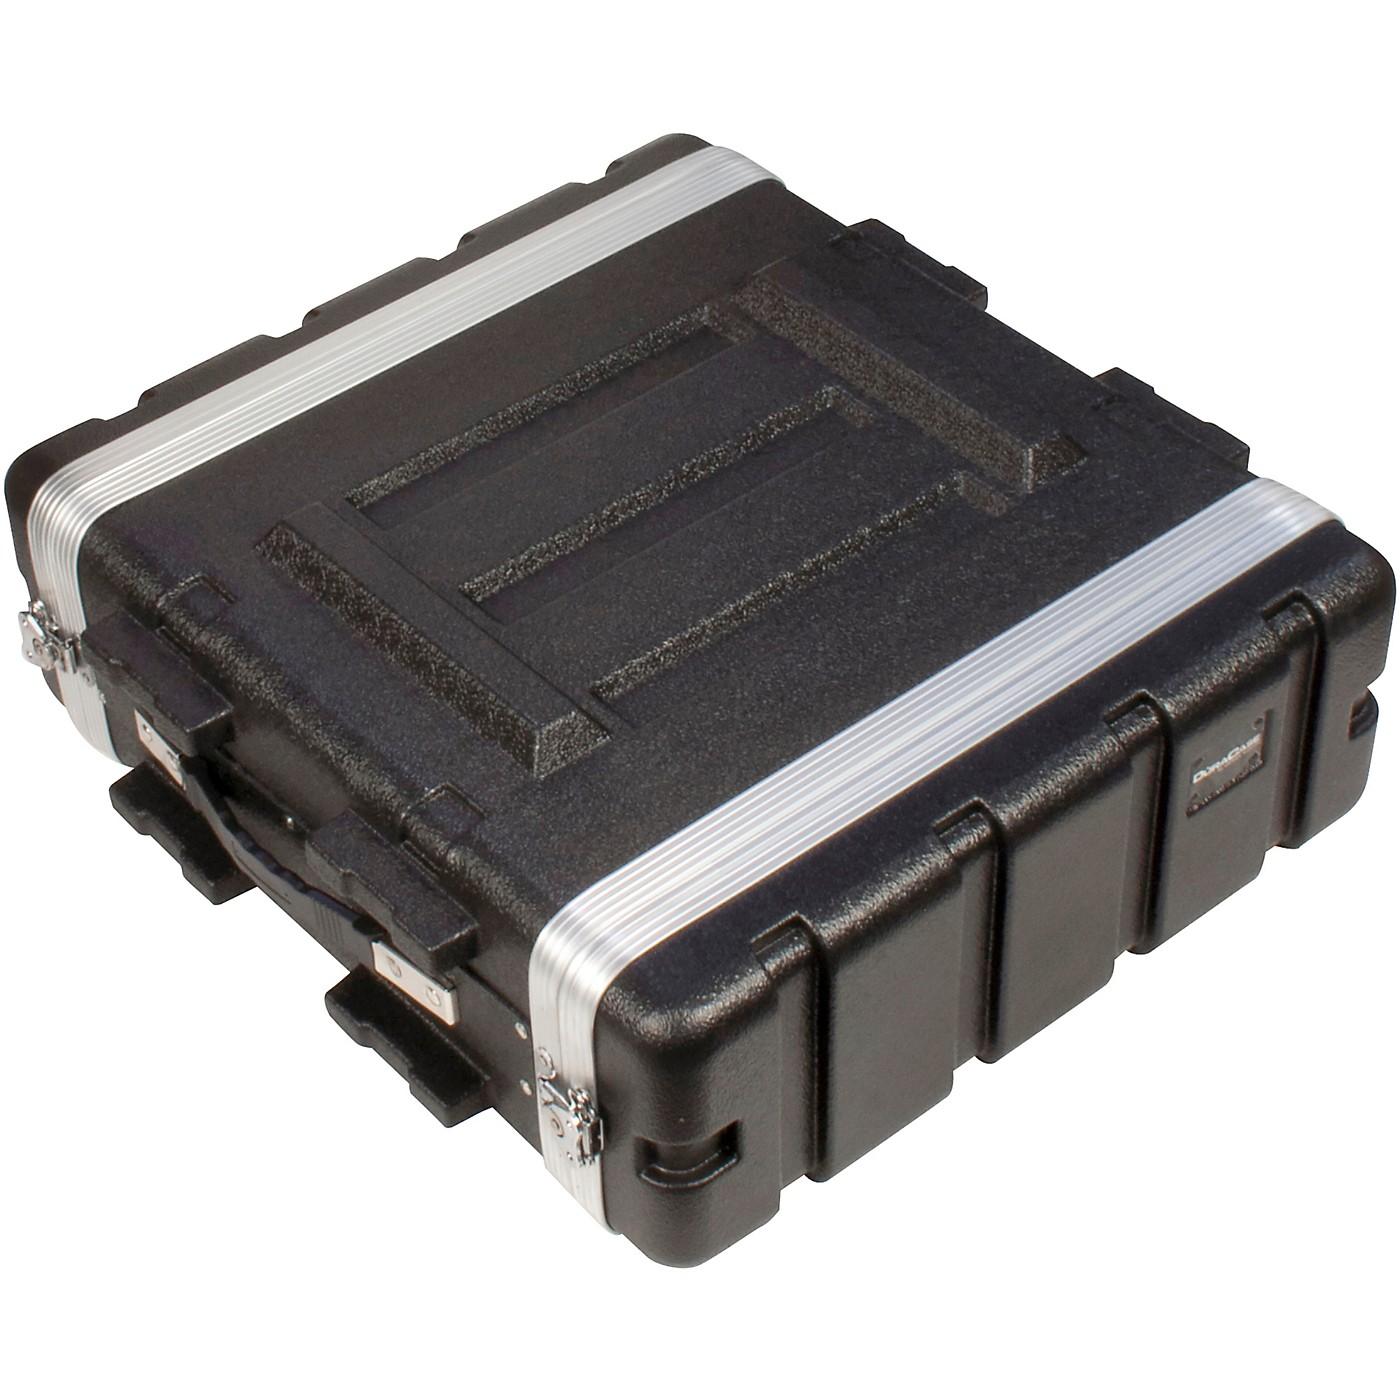 Ultimate Support DuraCase UR-3L Portable 3-Space Rackmount Case thumbnail